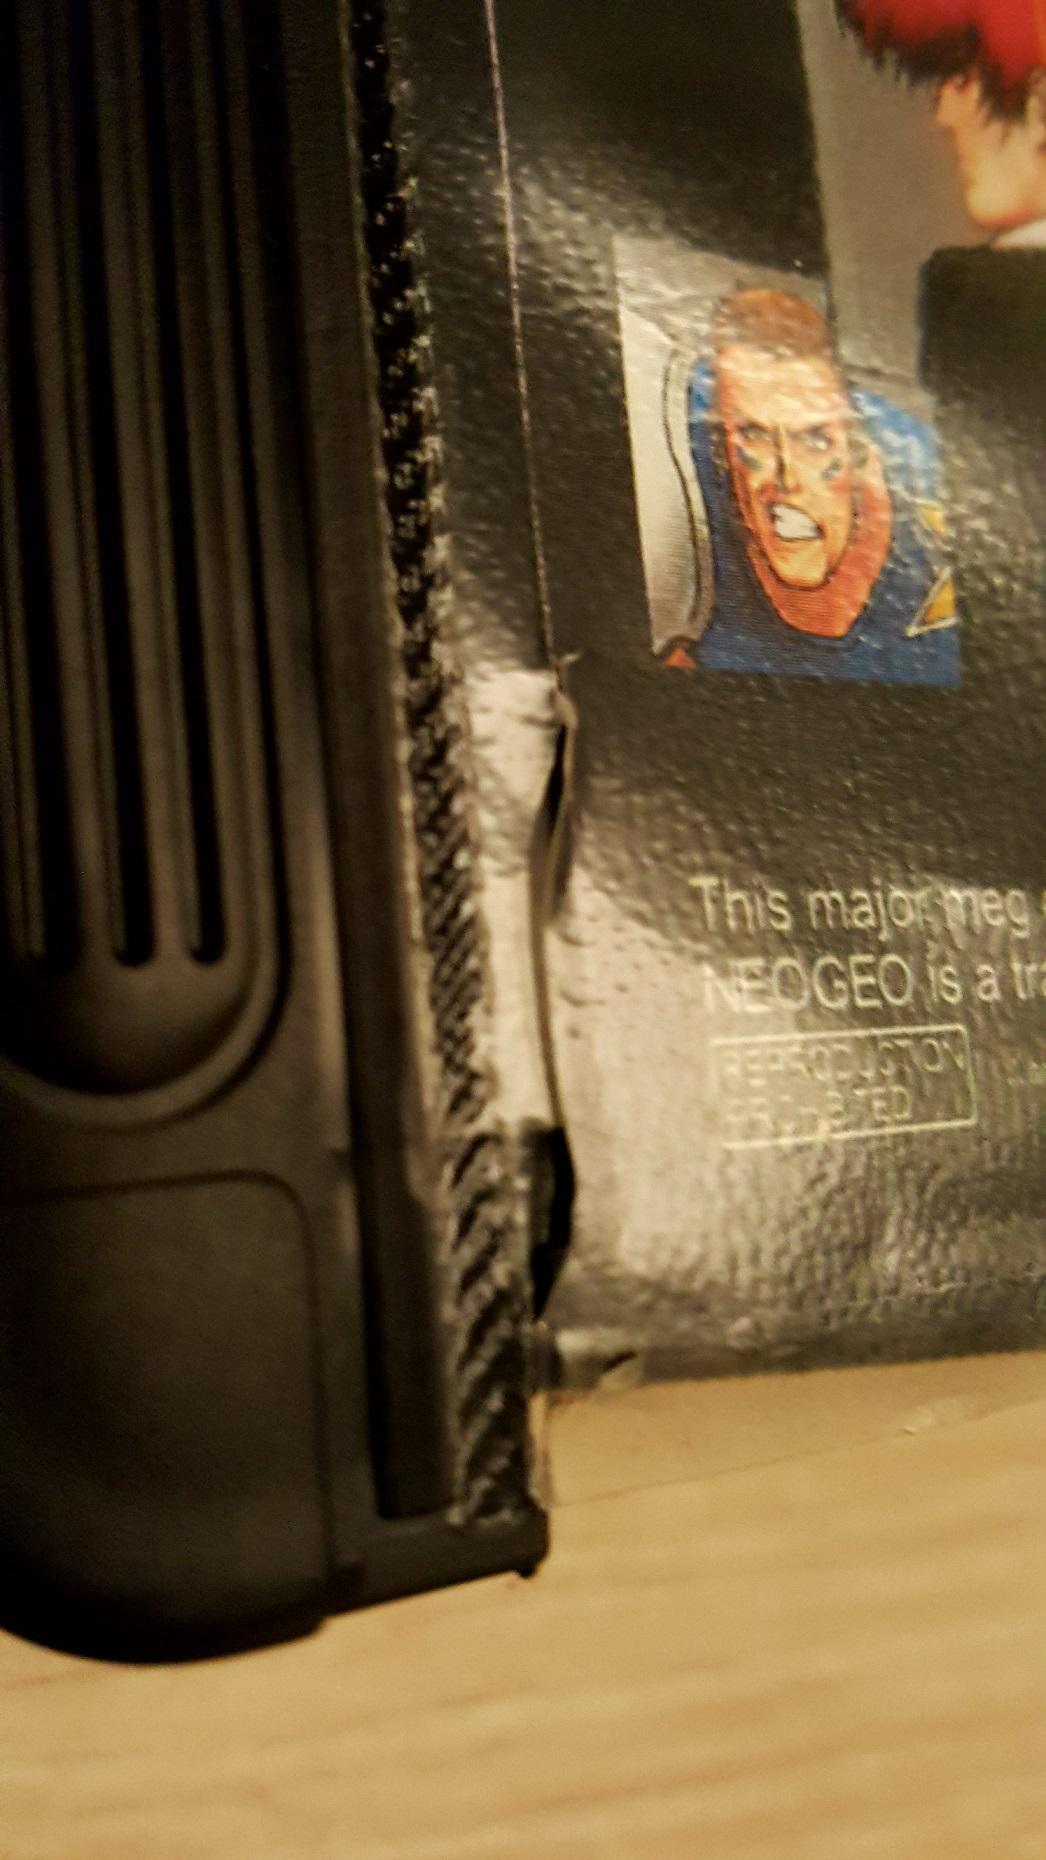 [RECH] Recherches de Larry Graham : MVS, AES, HuCards (éch jx gc, ps2, 360...) 1524556339-20180424-025050